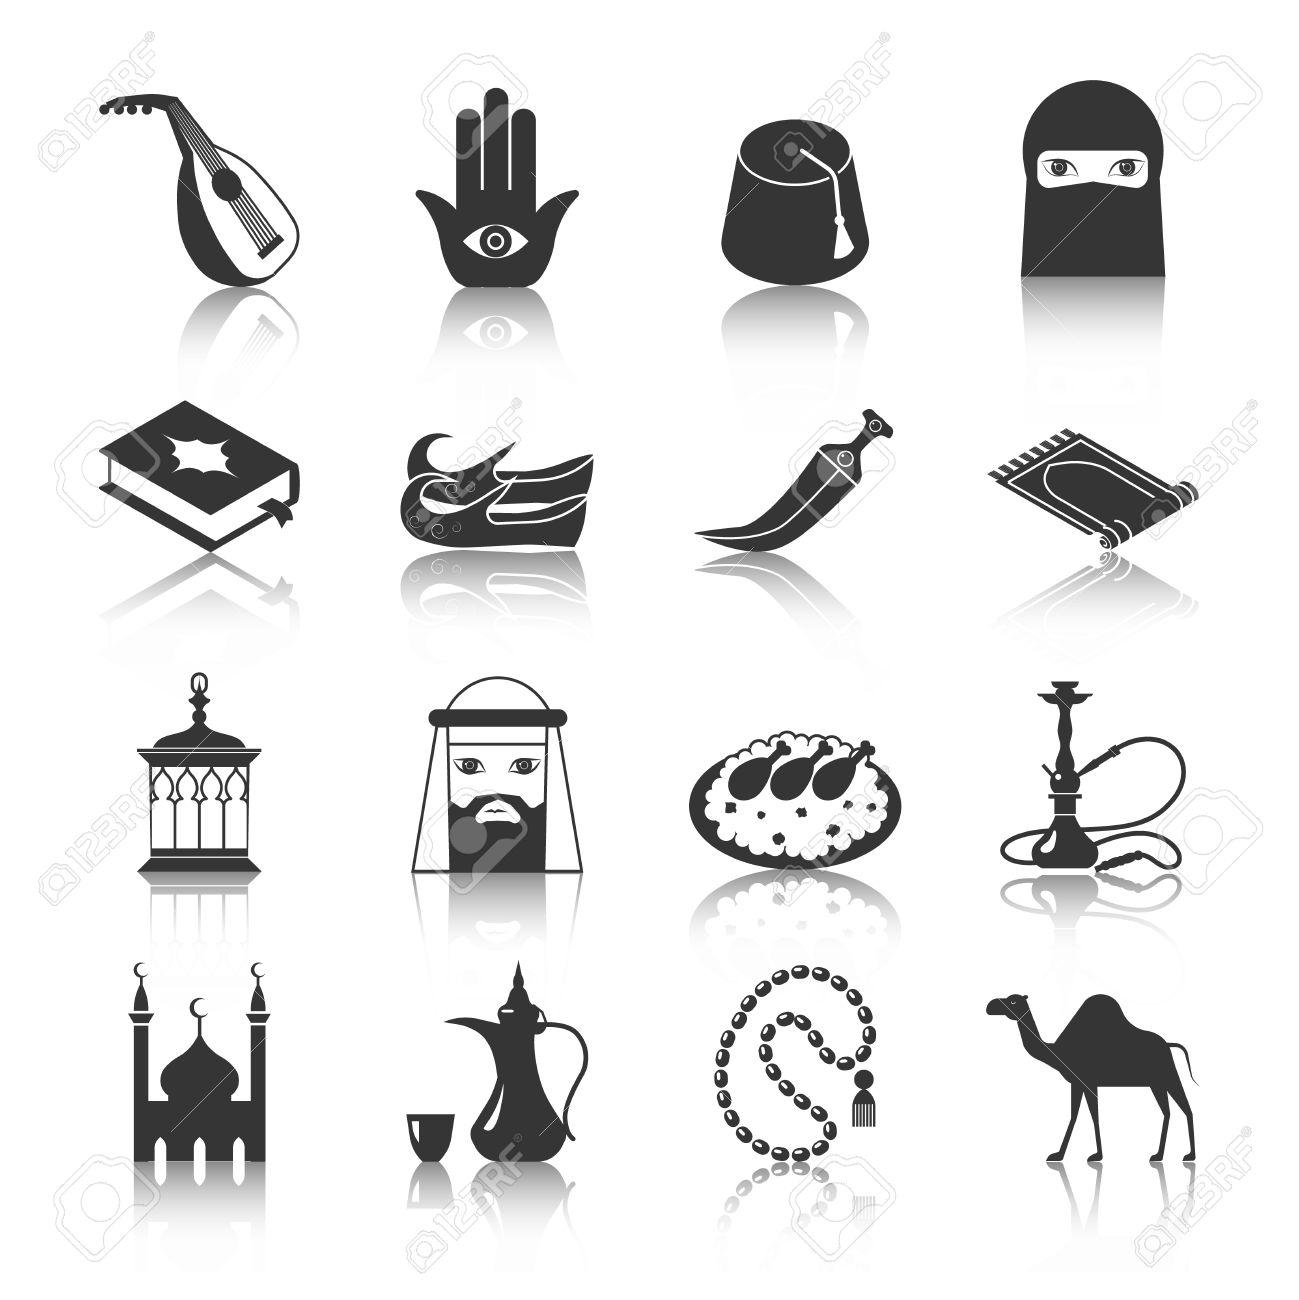 639 Arabian Gulf Stock Vector Illustration And Royalty Free.